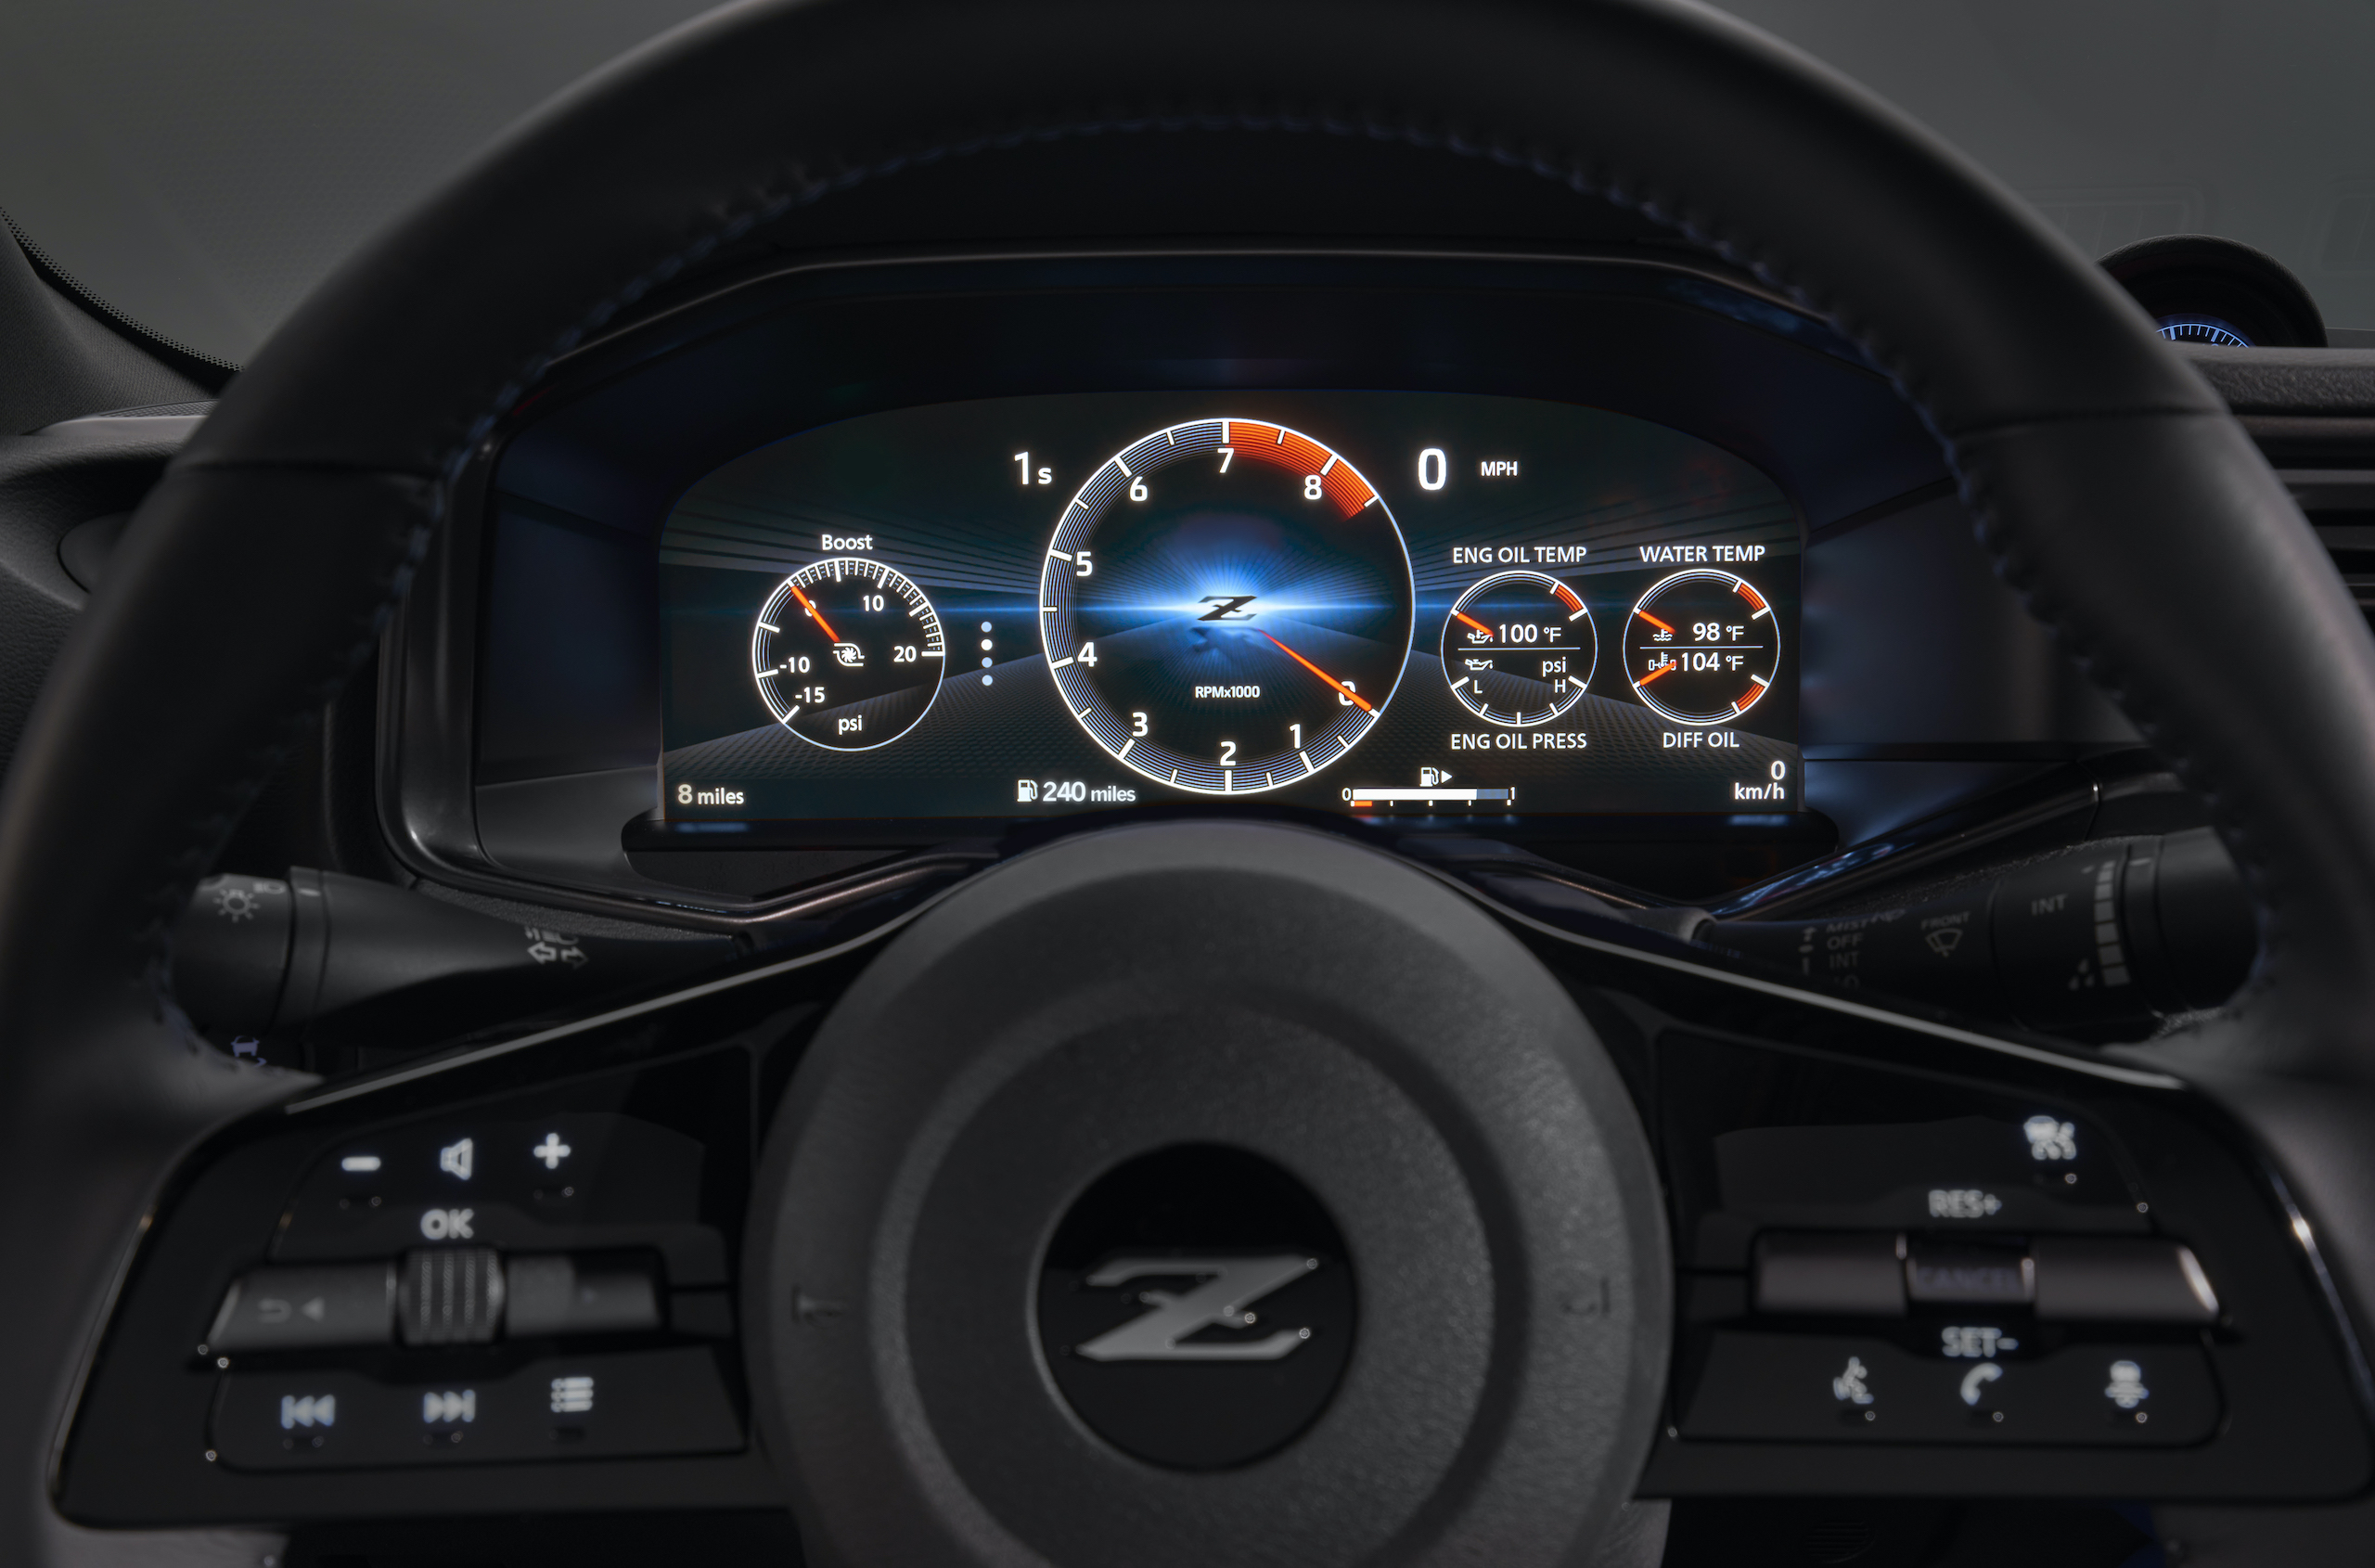 2023 Nissan Z interior digital dash